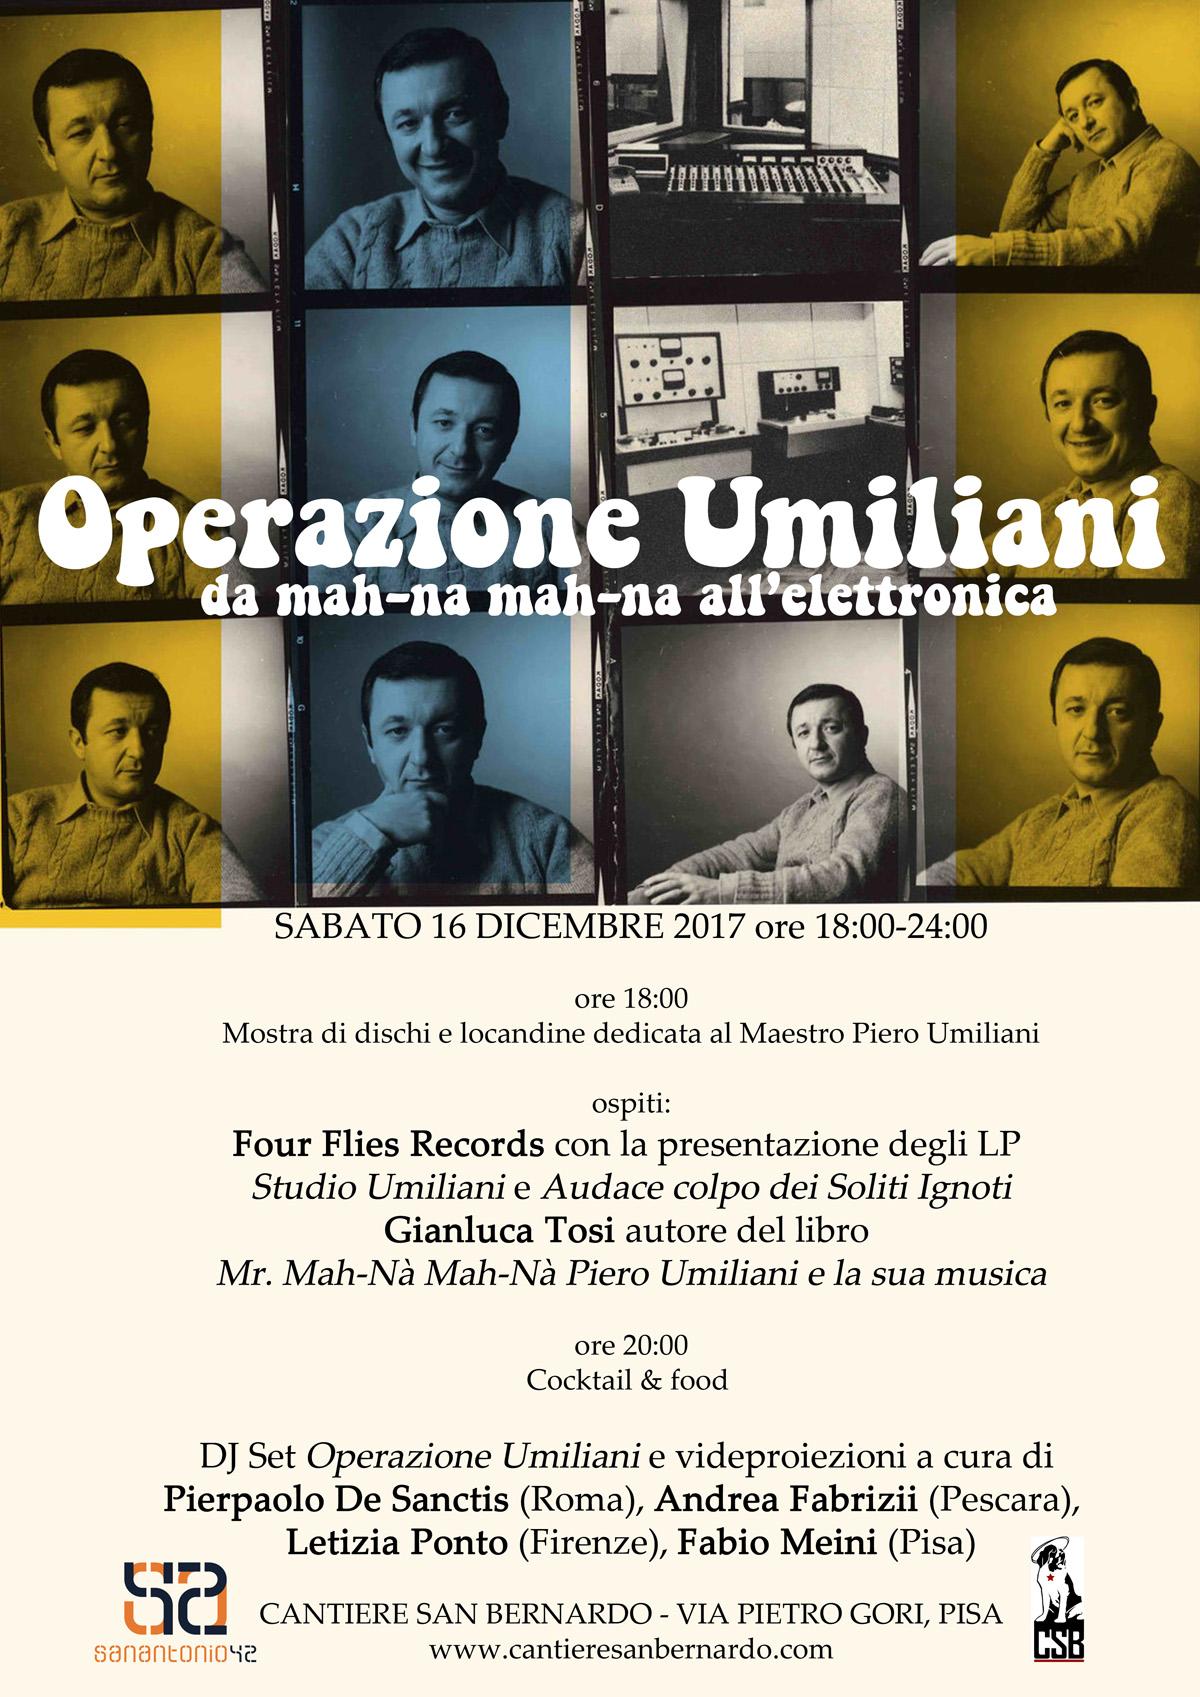 Operazione-Umiliani